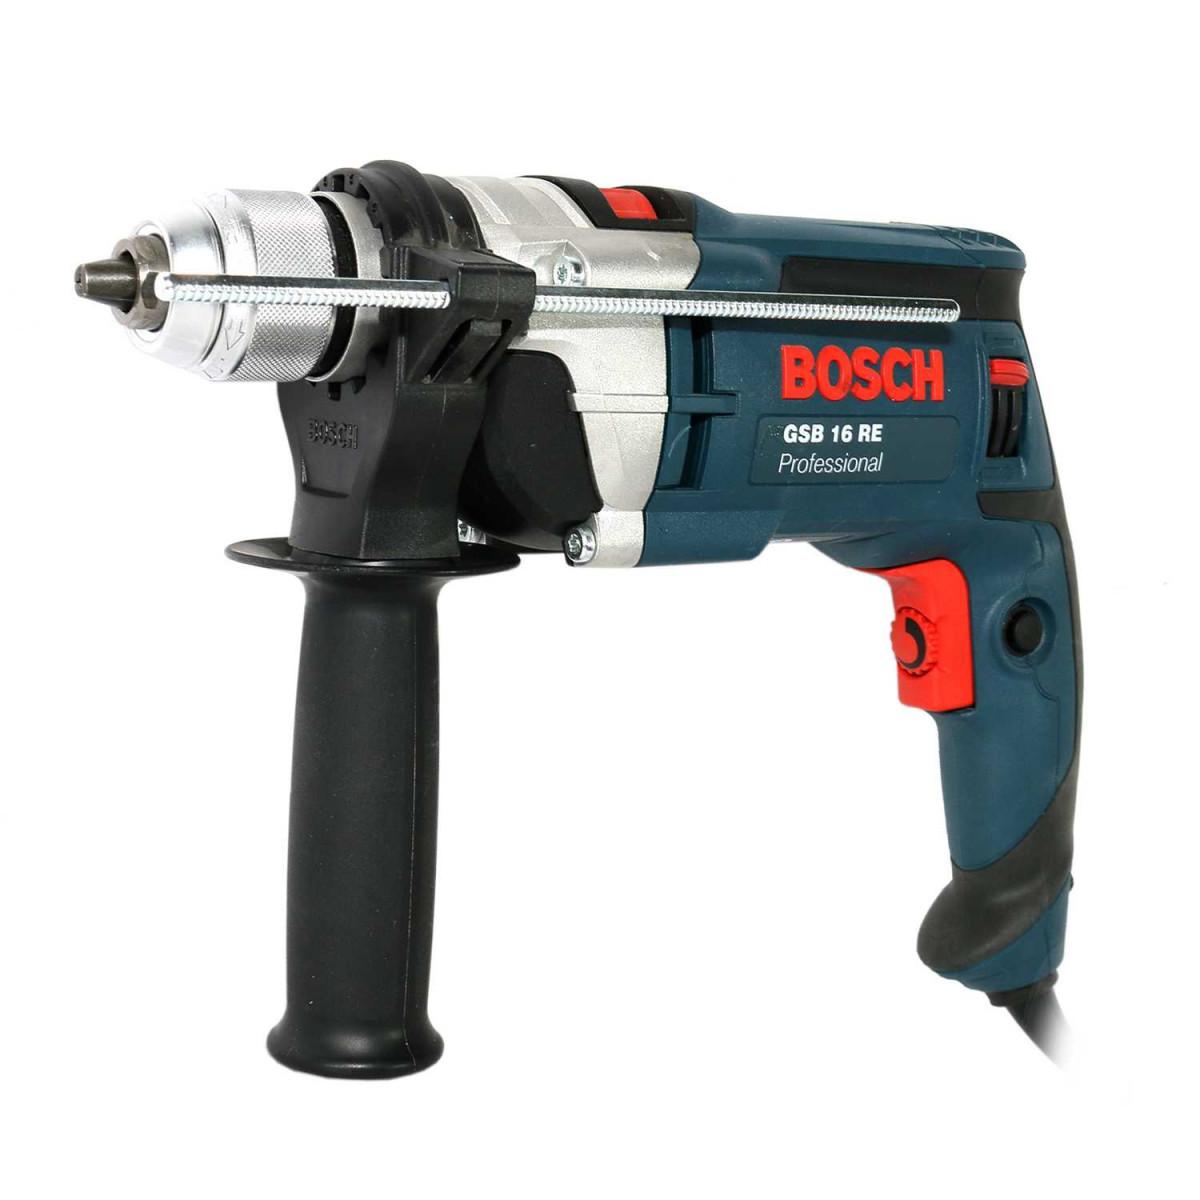 Дрель ударная  Bosch  GSB 16 RE  (750W,  реверс, бзп + кейс)  Россия  # 060114E